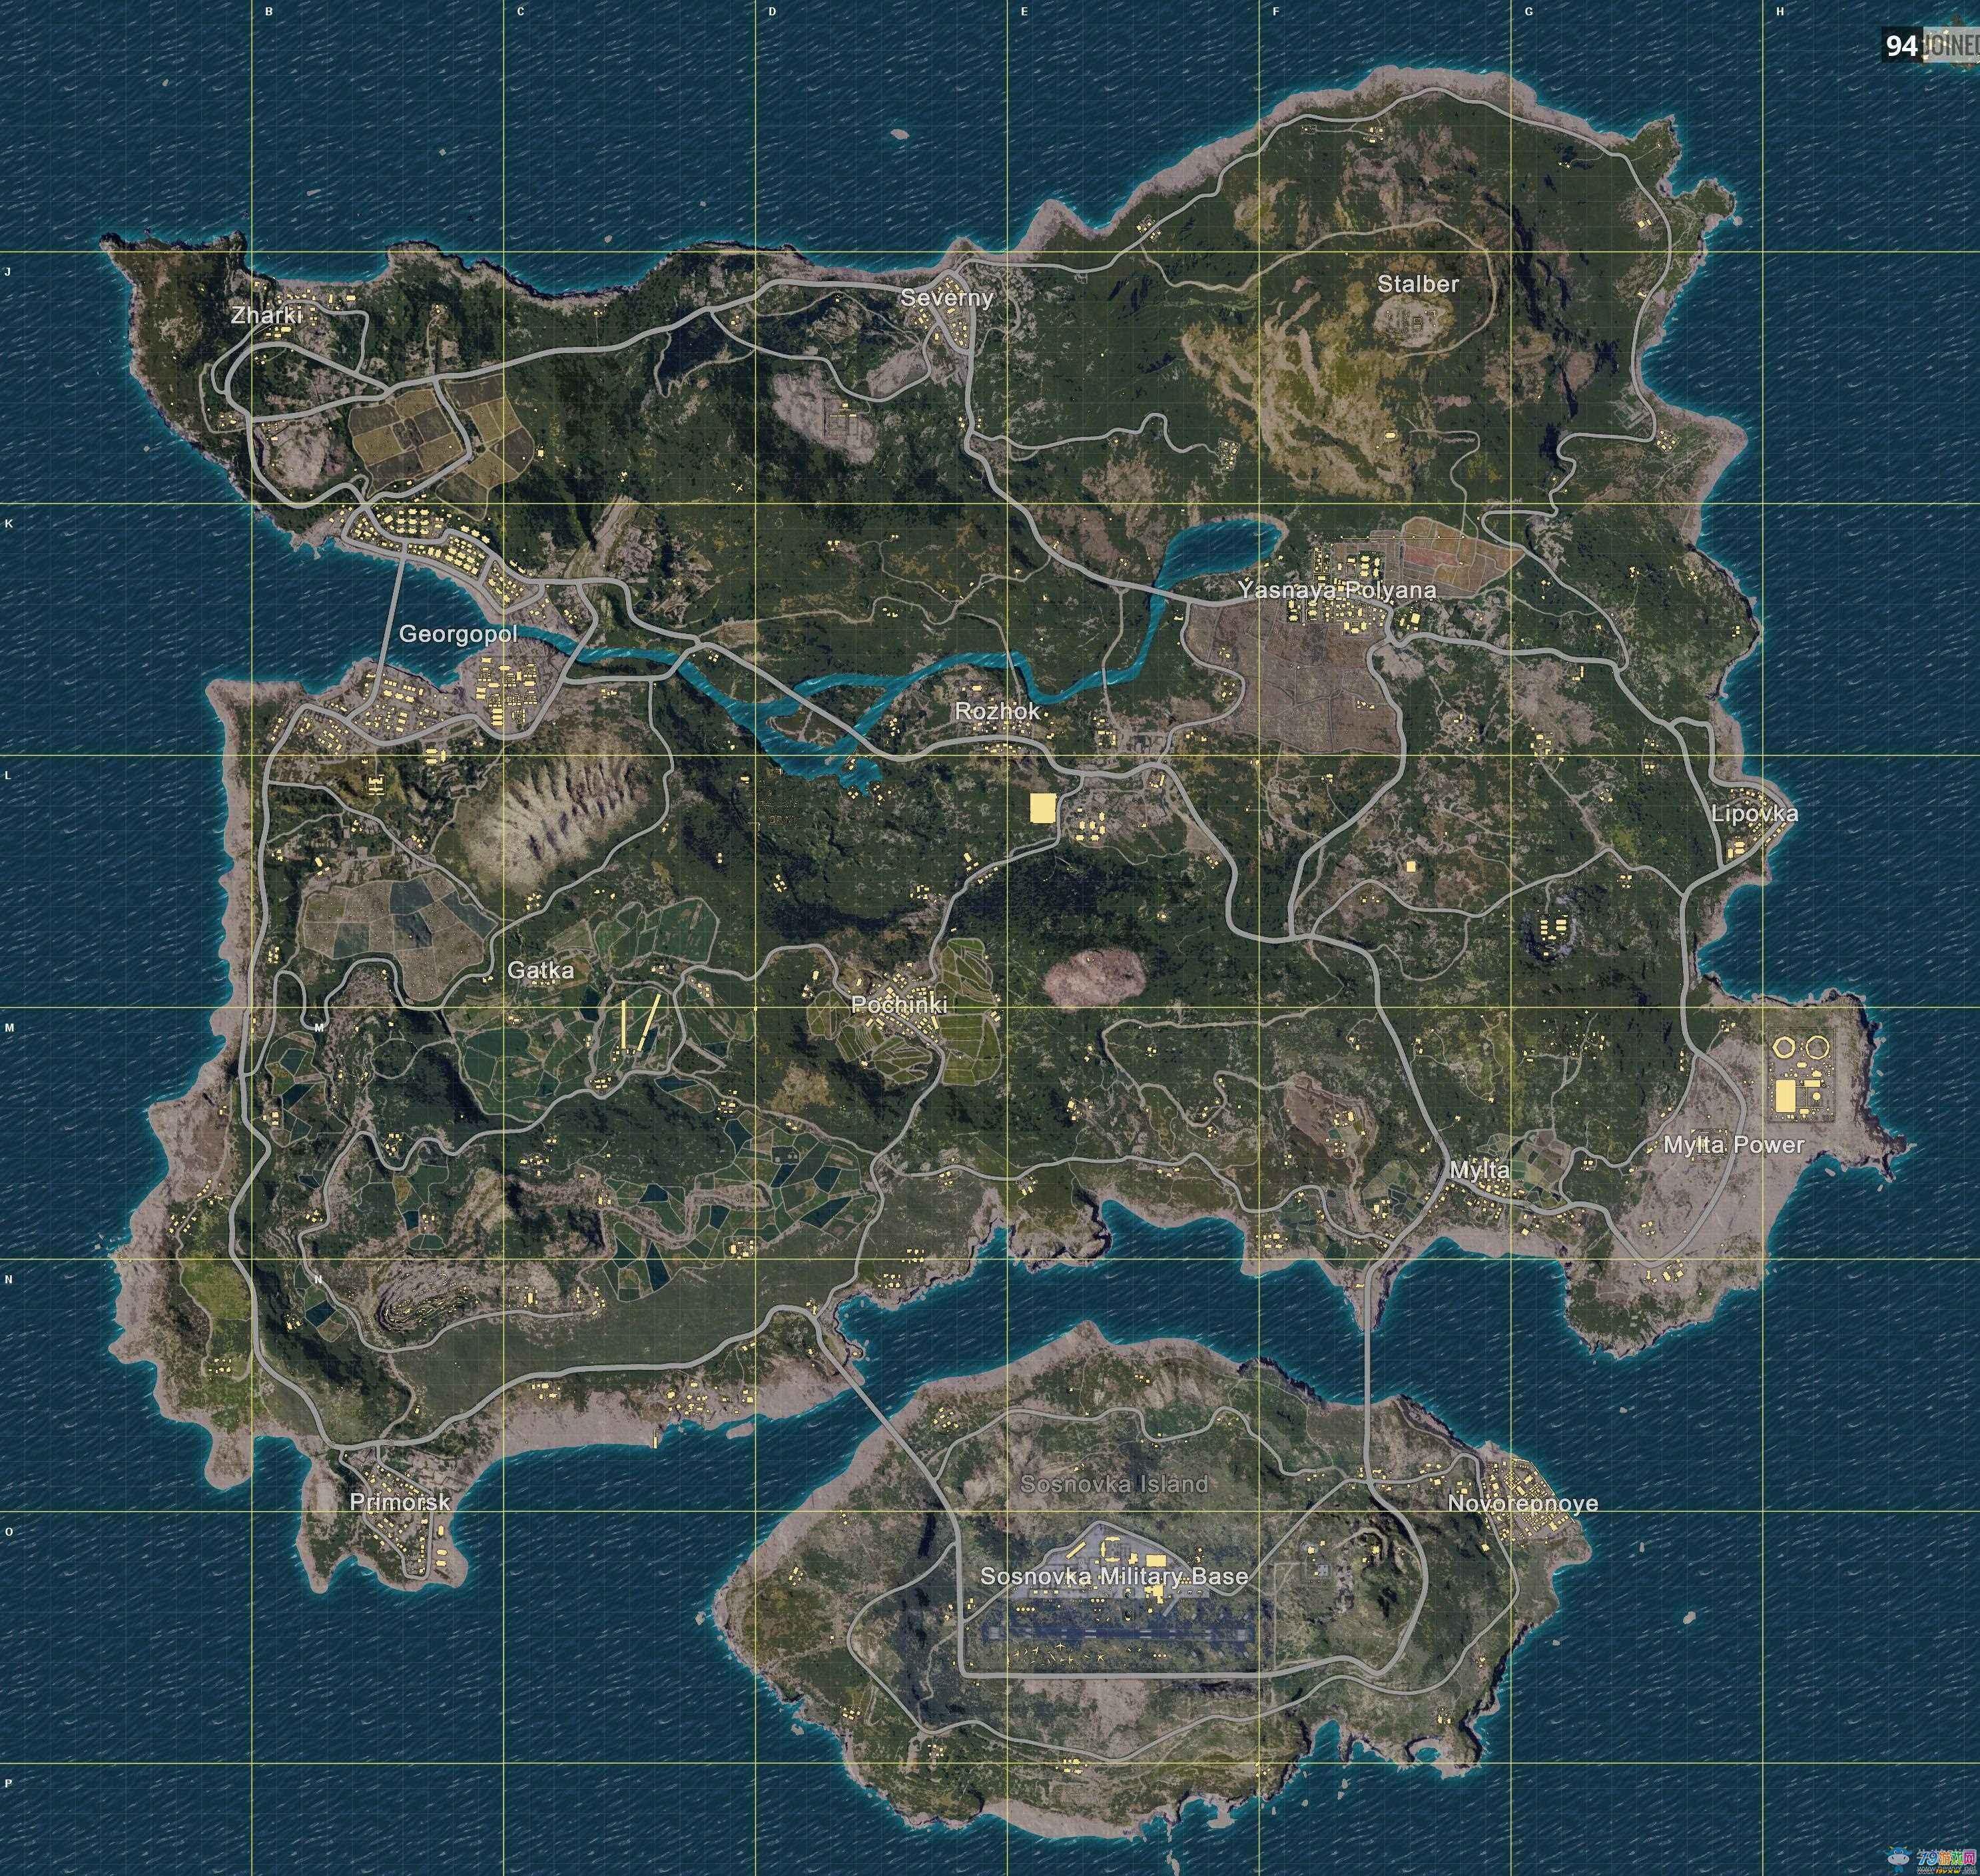 H1Z1大逃杀、Z2地图解析,刷车点,中文地图及坐标详细讲解